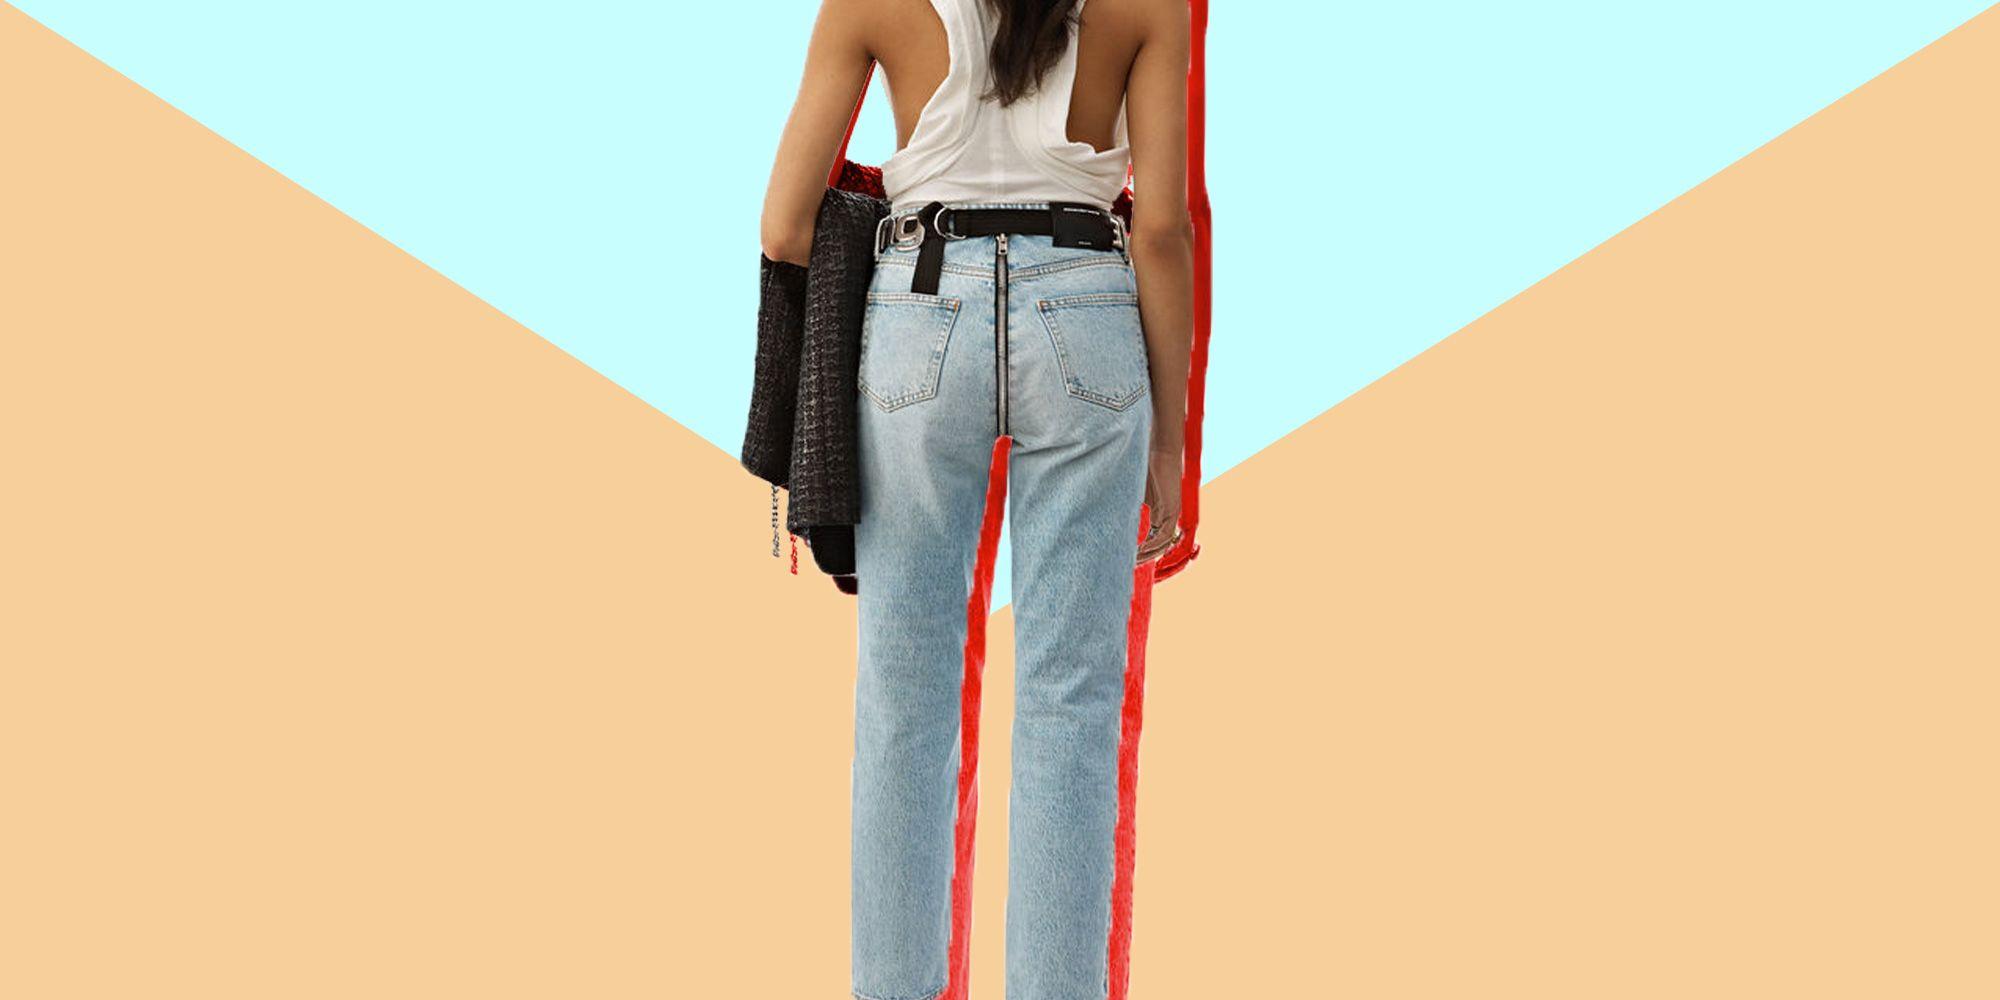 4d90387d587f jeans-primavera-estate-2019-alexander-wang-jeans-zip-sedere-foto-1550506660.jpg